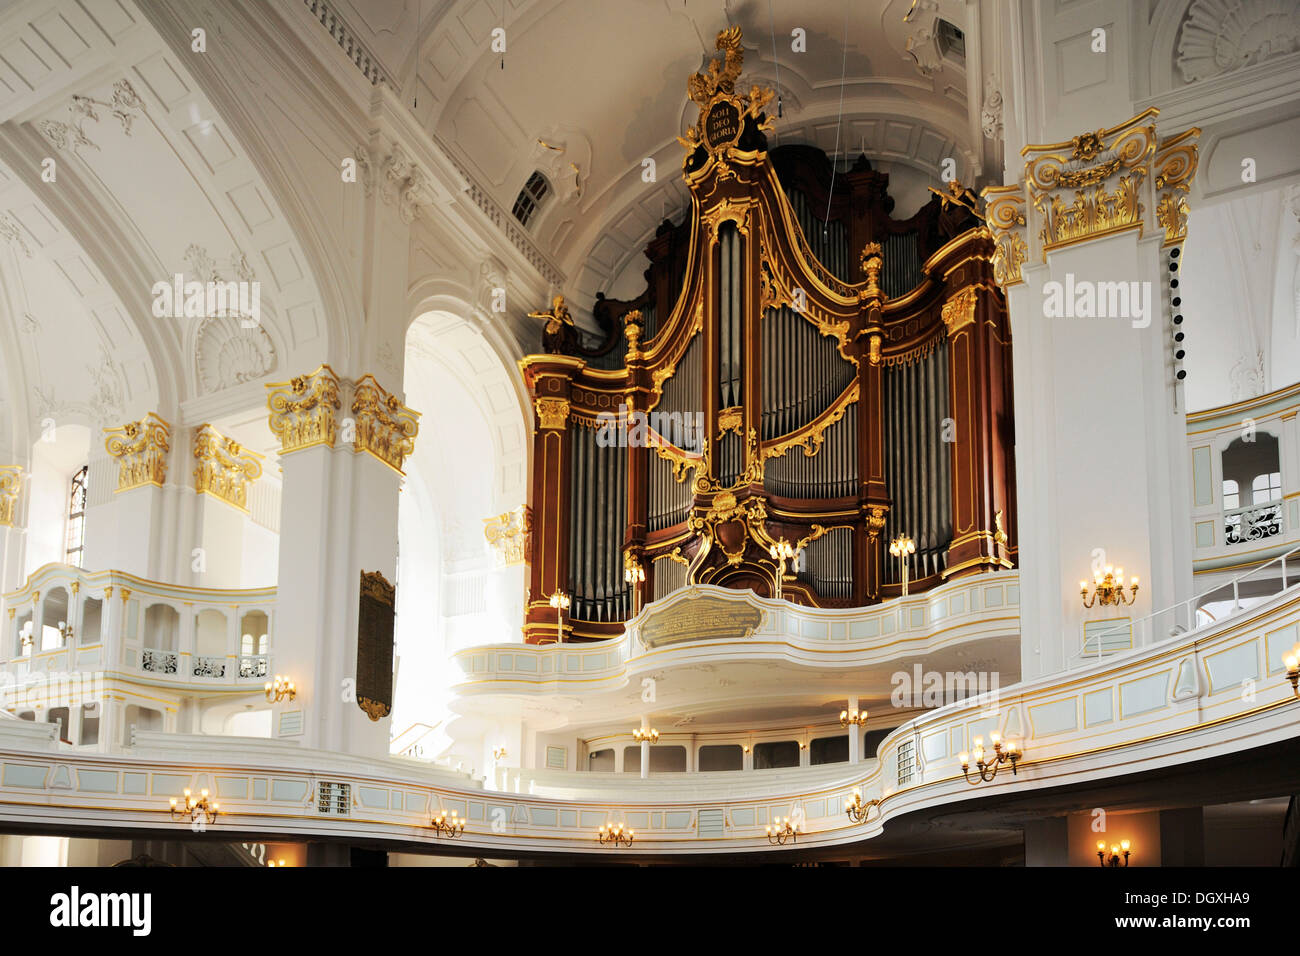 Vista interior de la iglesia barroca San Michaelis con órgano, Hamburgo Imagen De Stock